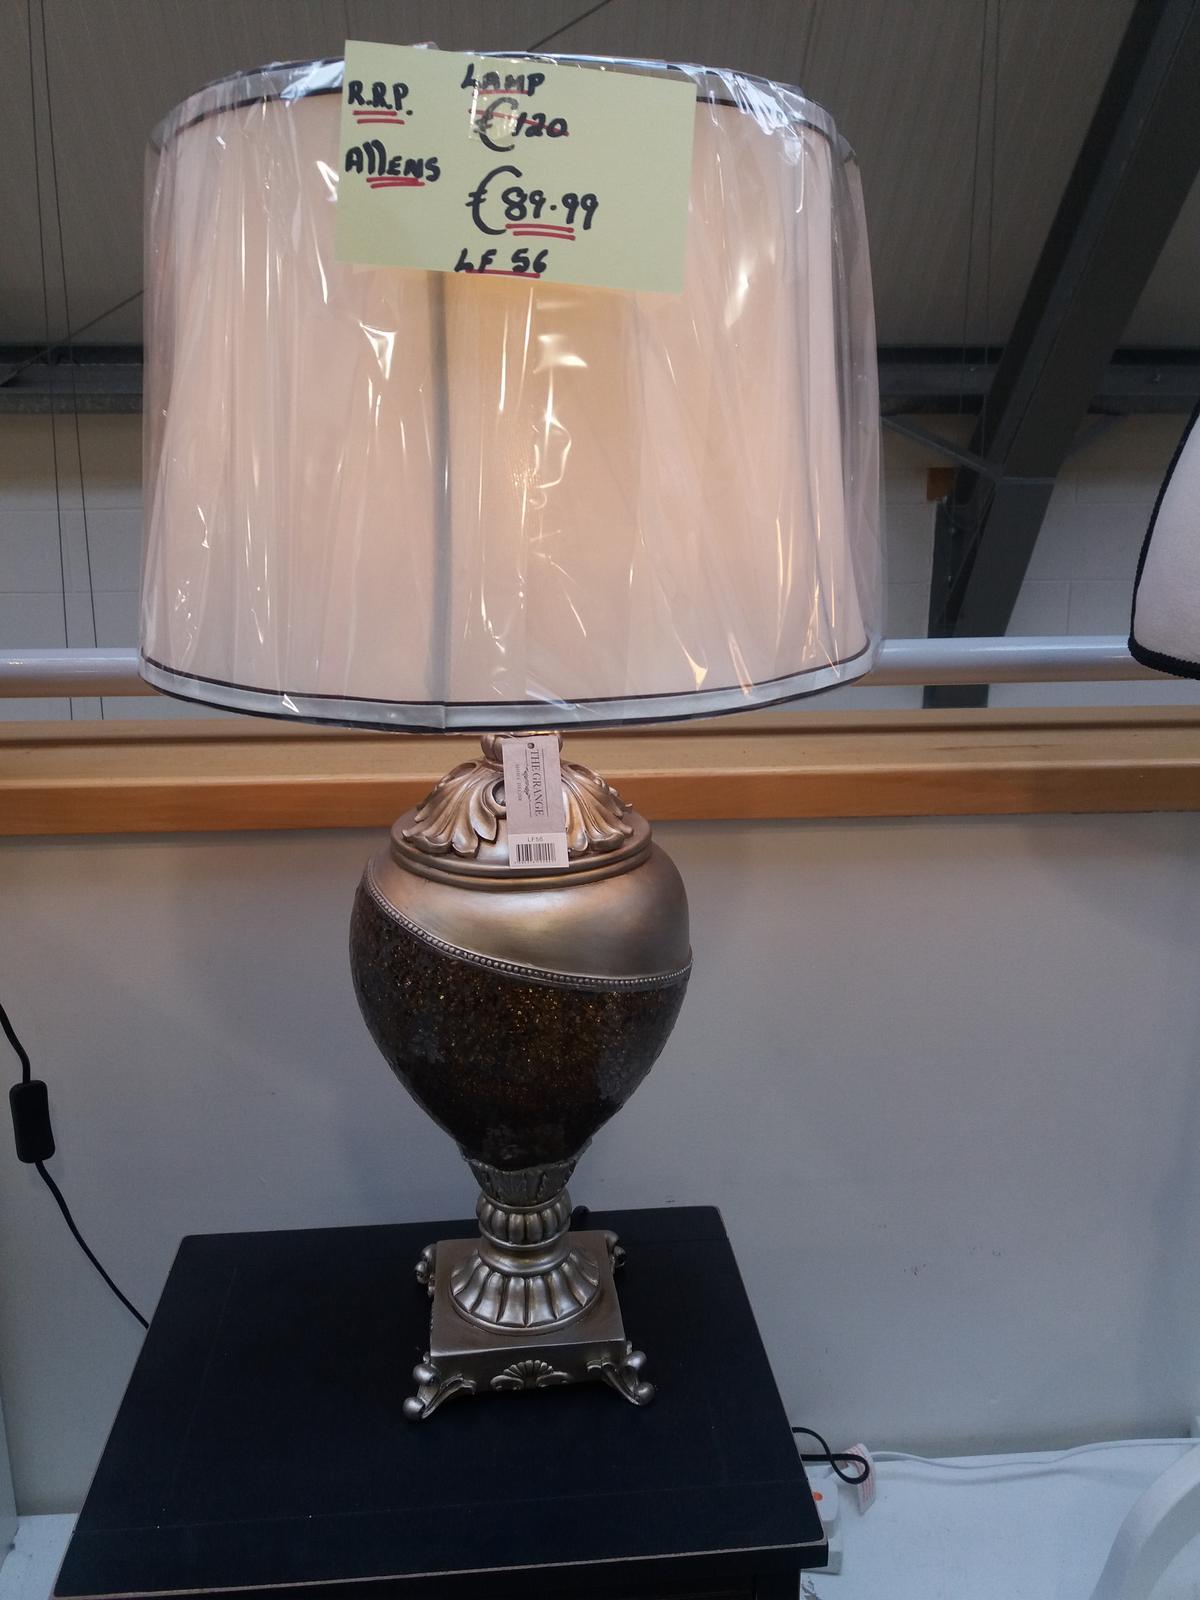 Prosim vas ktora z tychto lamp sa hodi na komdu na prvom obrazku..nebude to vyzerat ako u babicky doma😂dakujem za kazdu radu,nerad by som aby mi ju zena otrepala o hlavu ked jej ju dam k narodkam...) - Obrázok č. 3